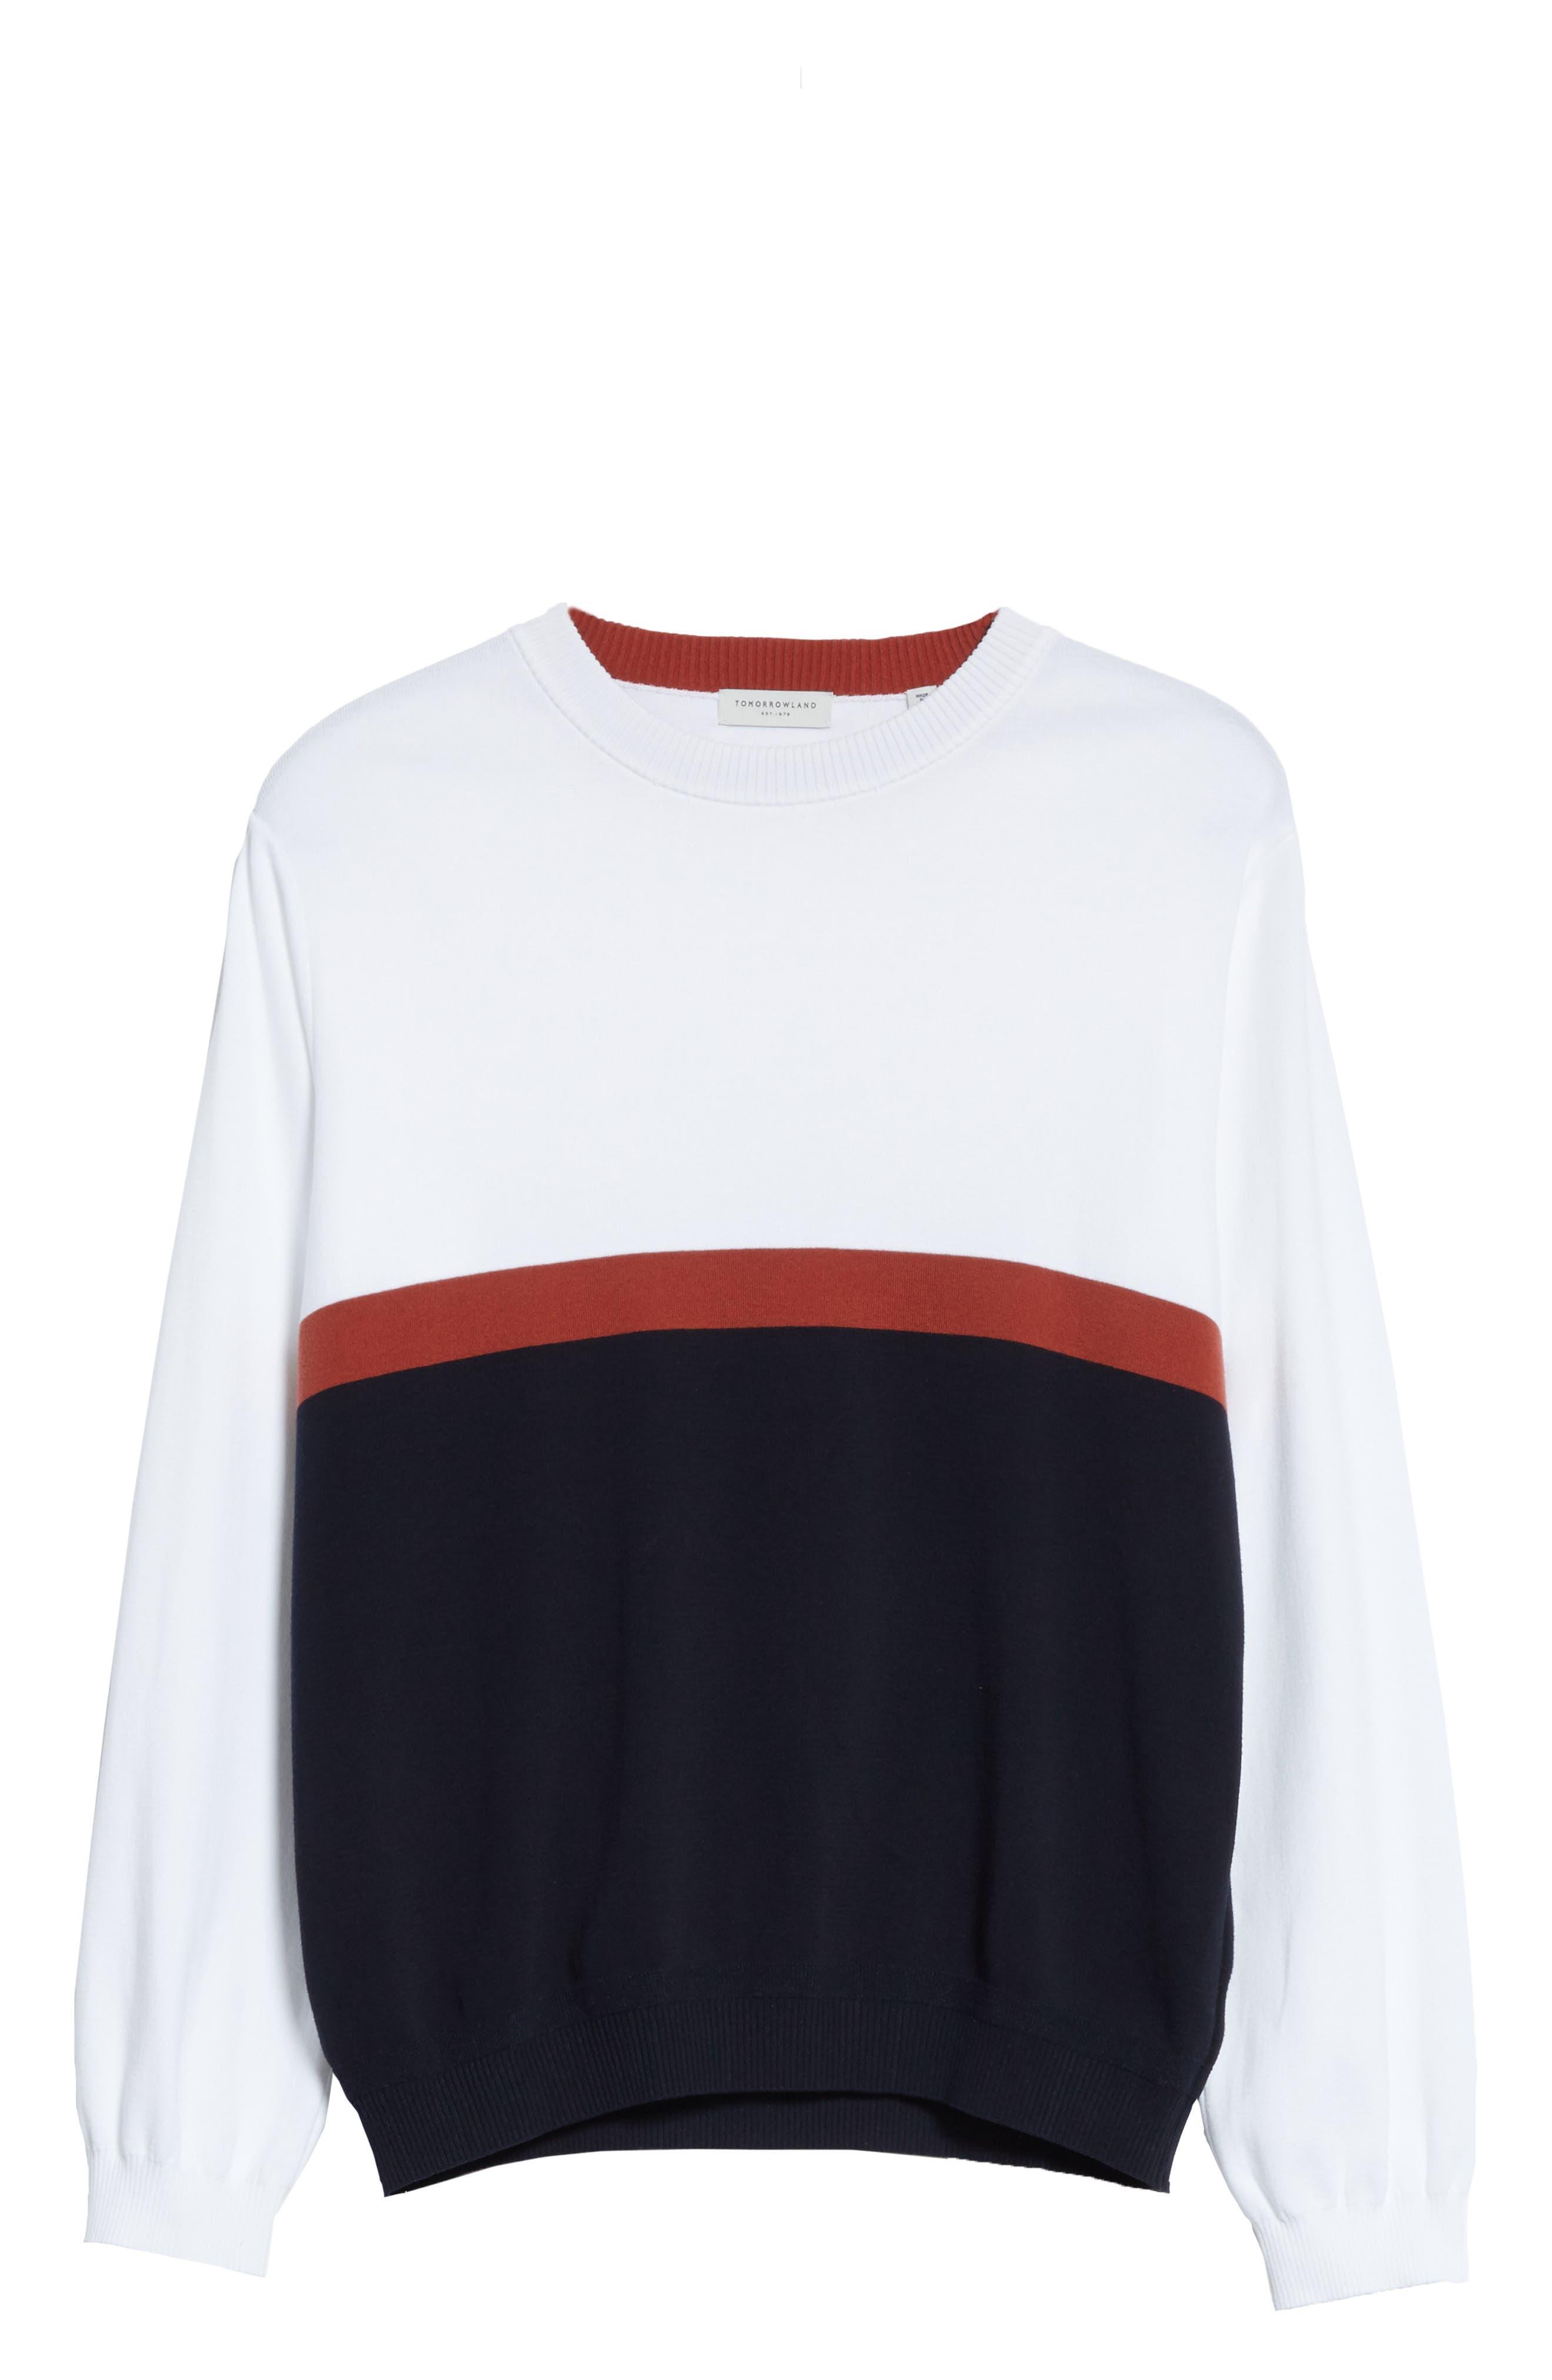 Colorblock Crewneck Sweater,                             Alternate thumbnail 6, color,                             100